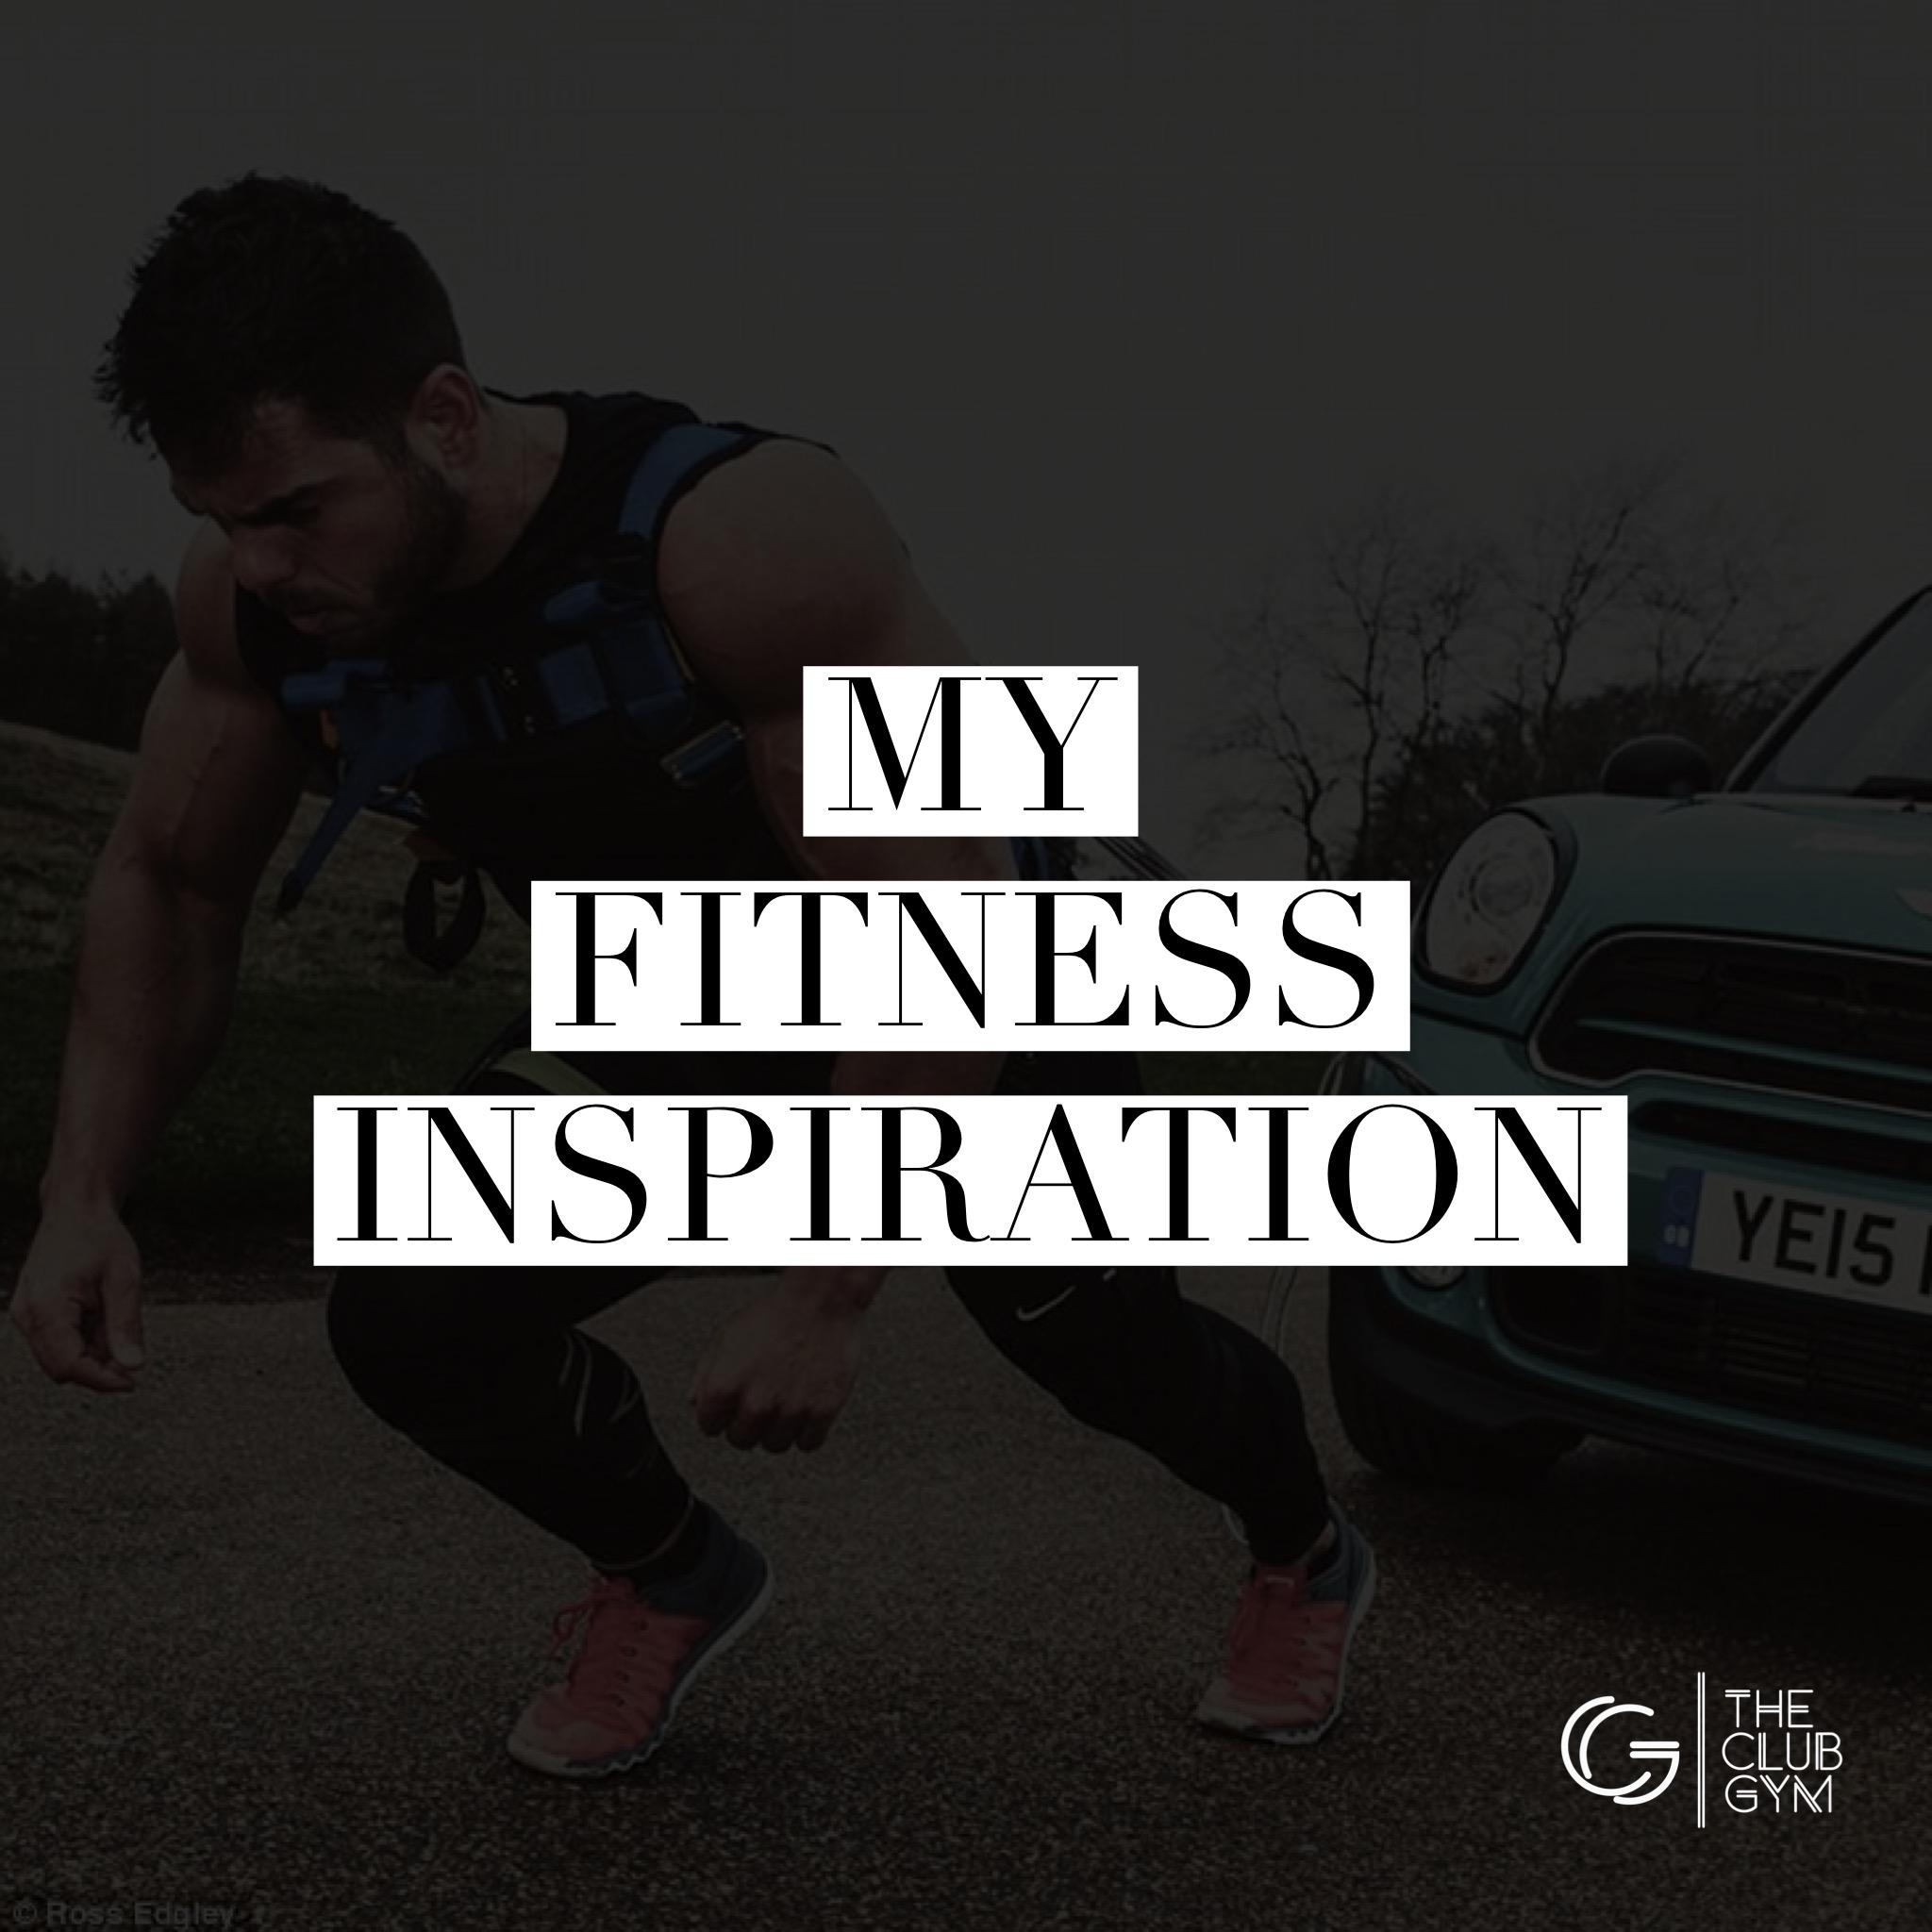 Fitness Inspiration - The Club Gym